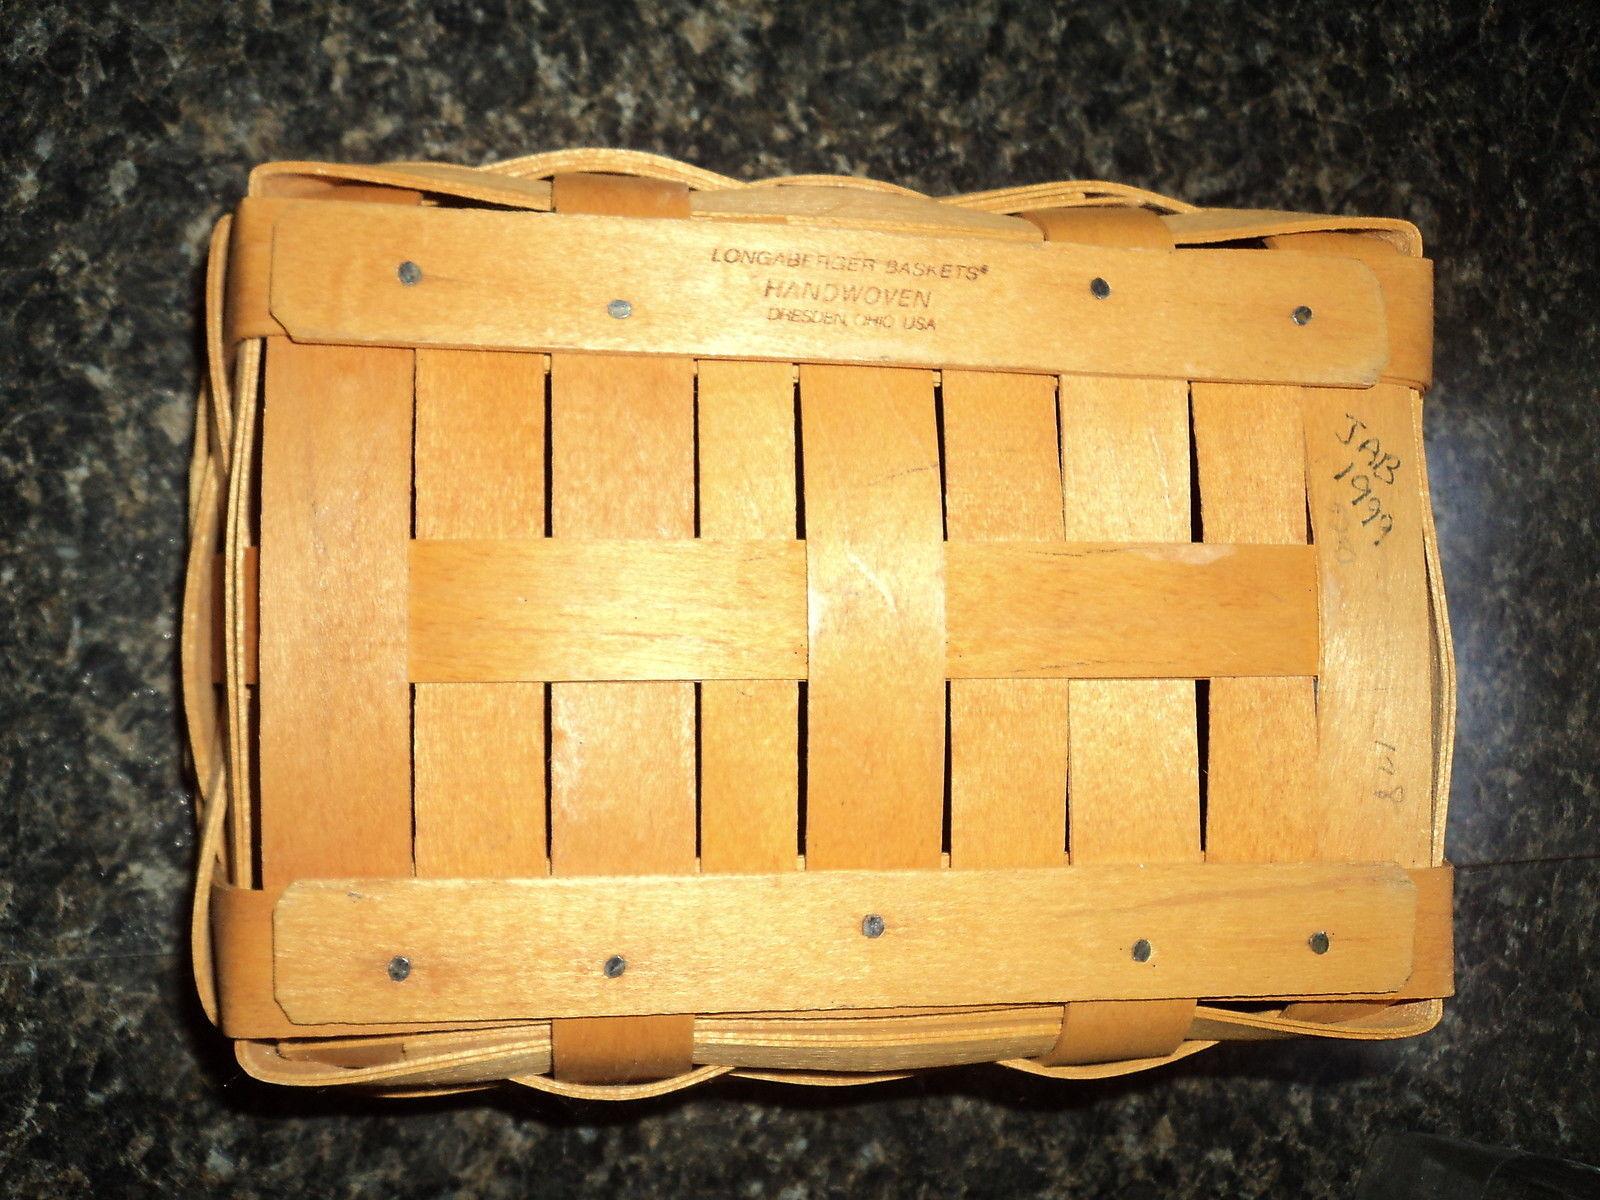 1999 Longaberger Start Success Notepad Basket with Protector